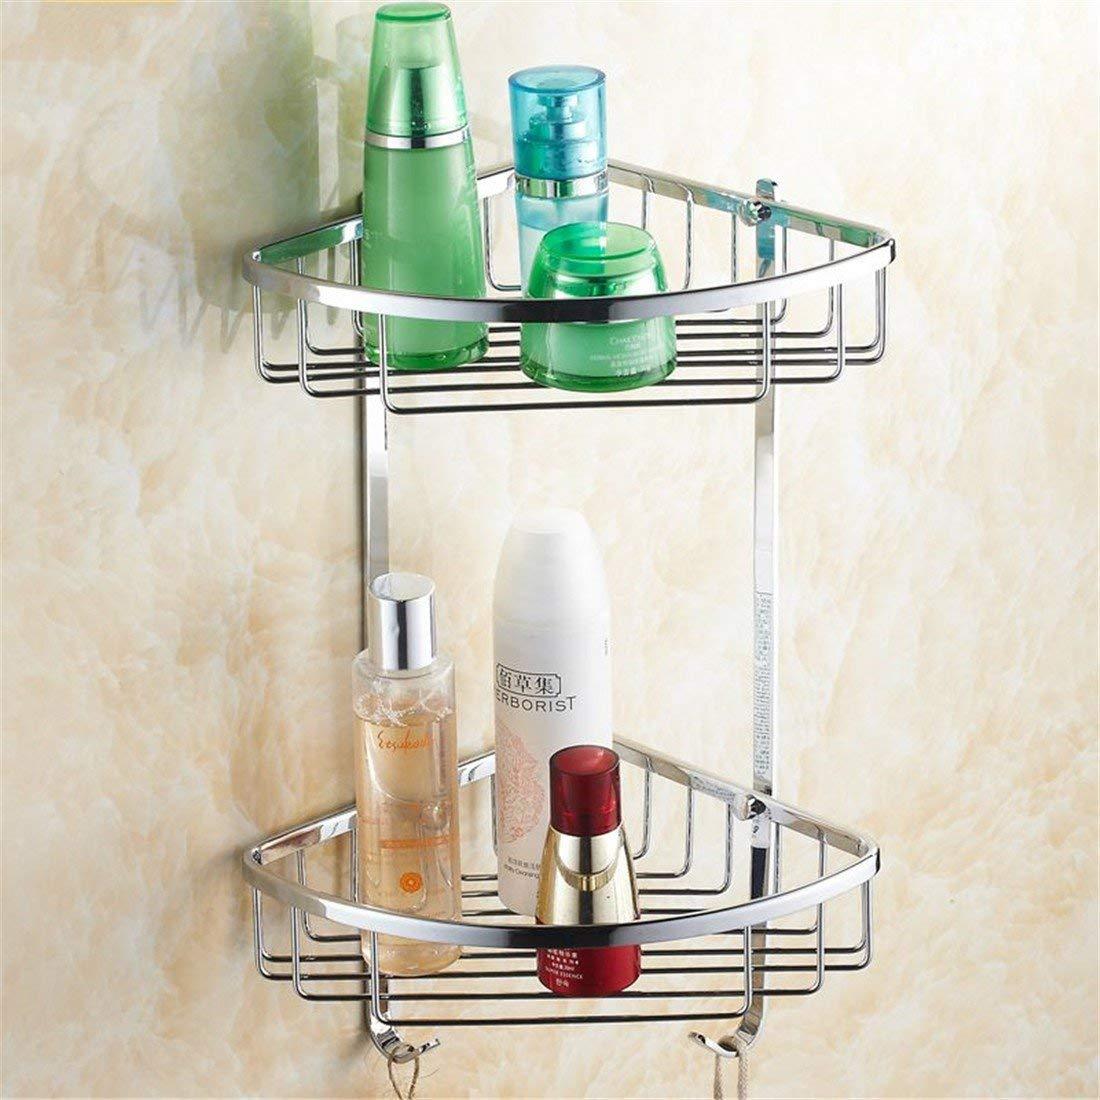 LAONA A contemporary minimalist Brass chrome bathroom accessory kit bath towel rack Towel racks, built-in basket 2 B